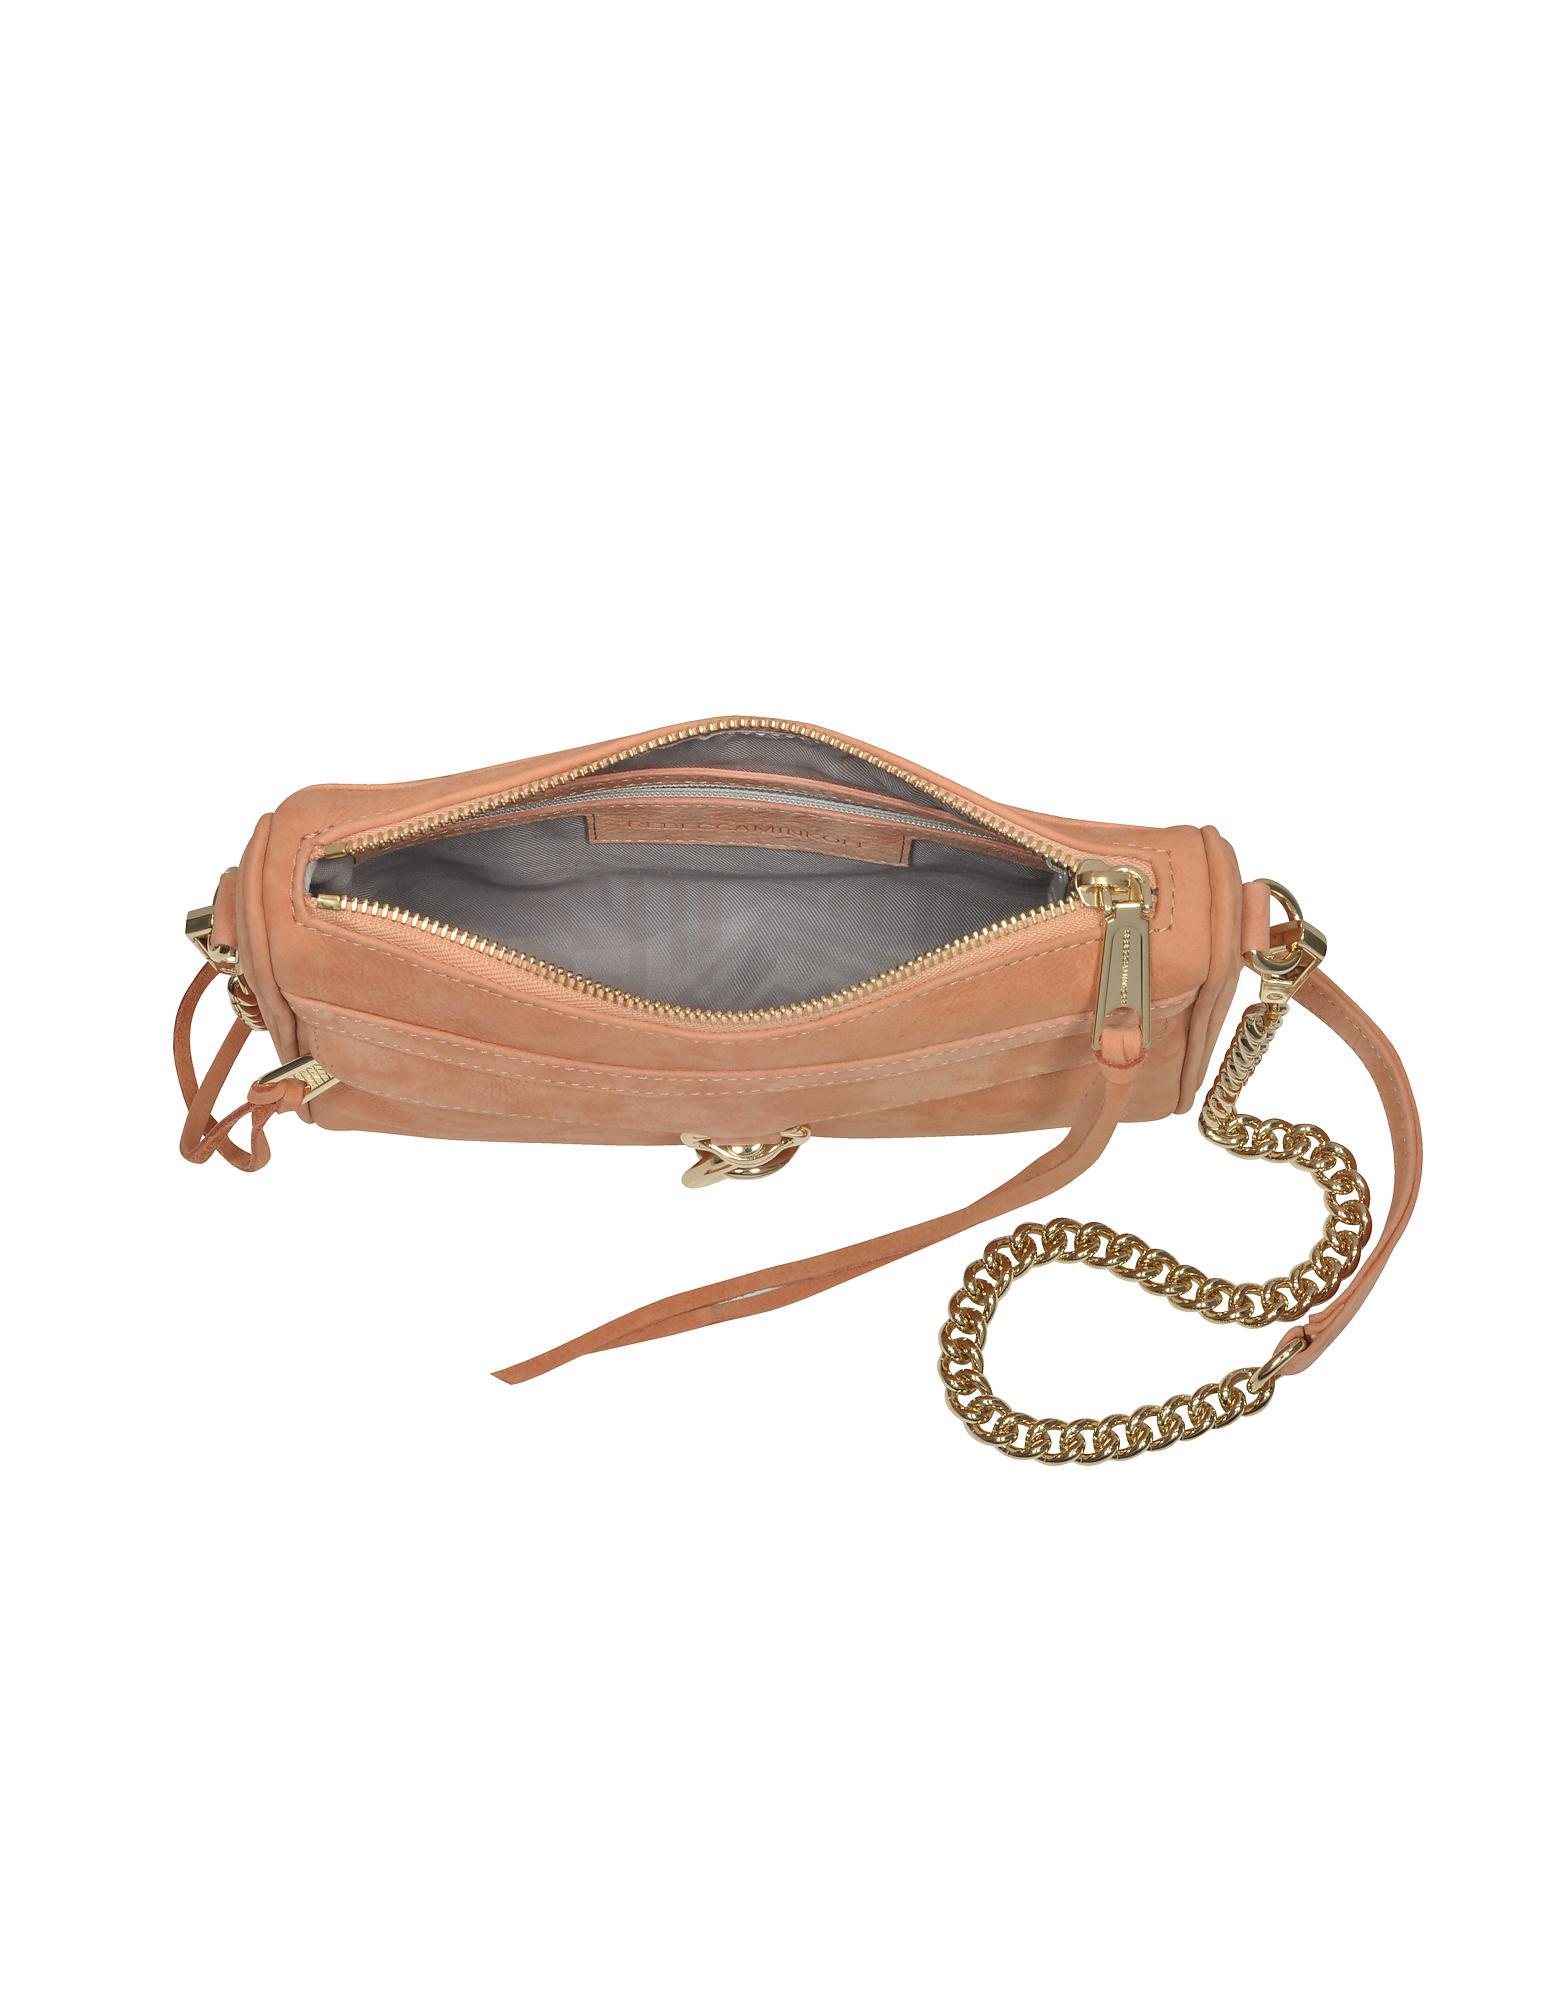 e11e4a7d4fe7c Lyst - Rebecca Minkoff Dusty Peach Leather Mini M.a.c. Crossbody Bag ...